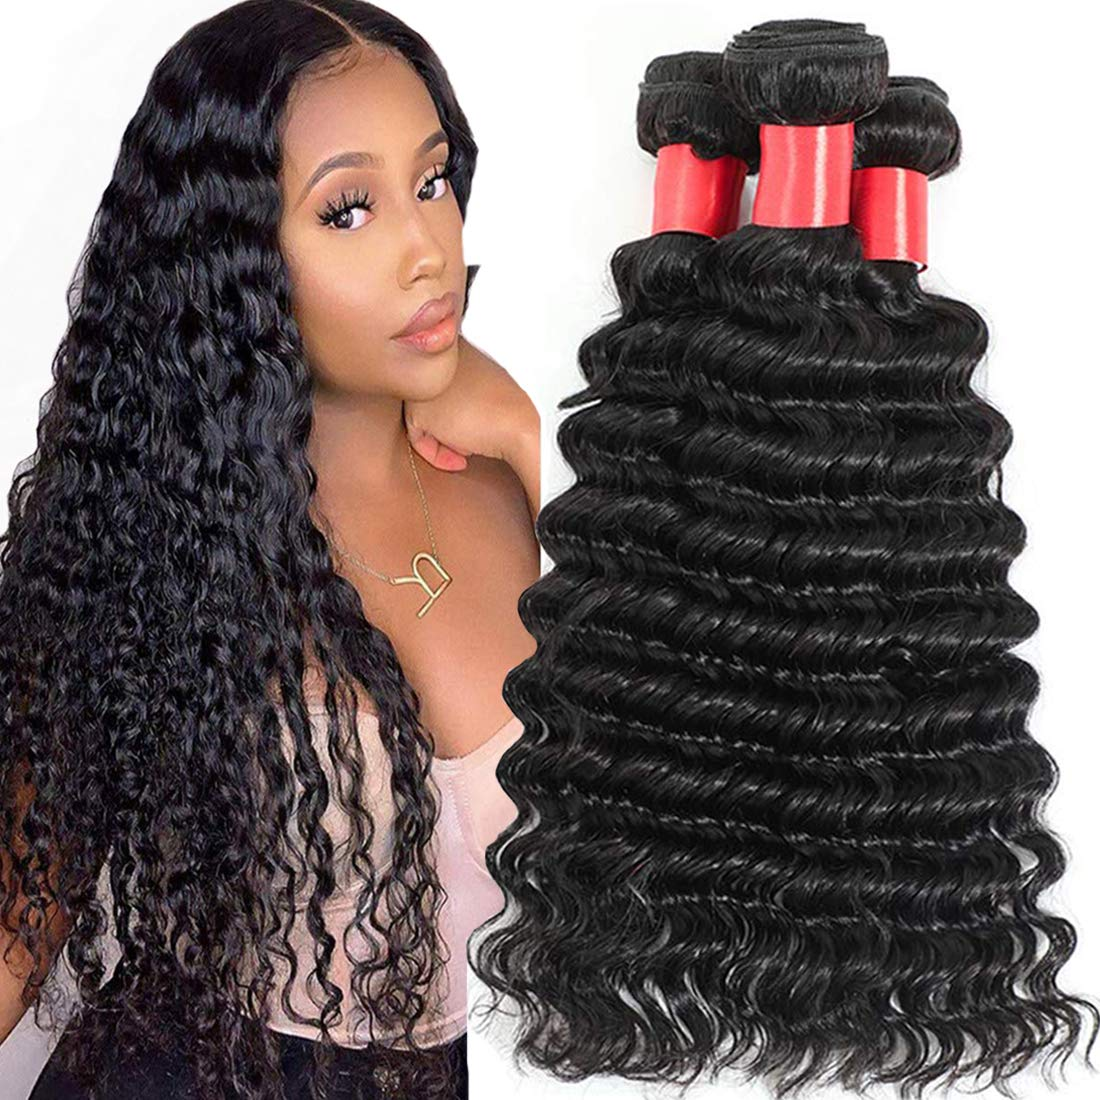 AUTTO Hair 信託 Unprocessed Brazilian Virgin Human Deep 4 B 授与 Wave